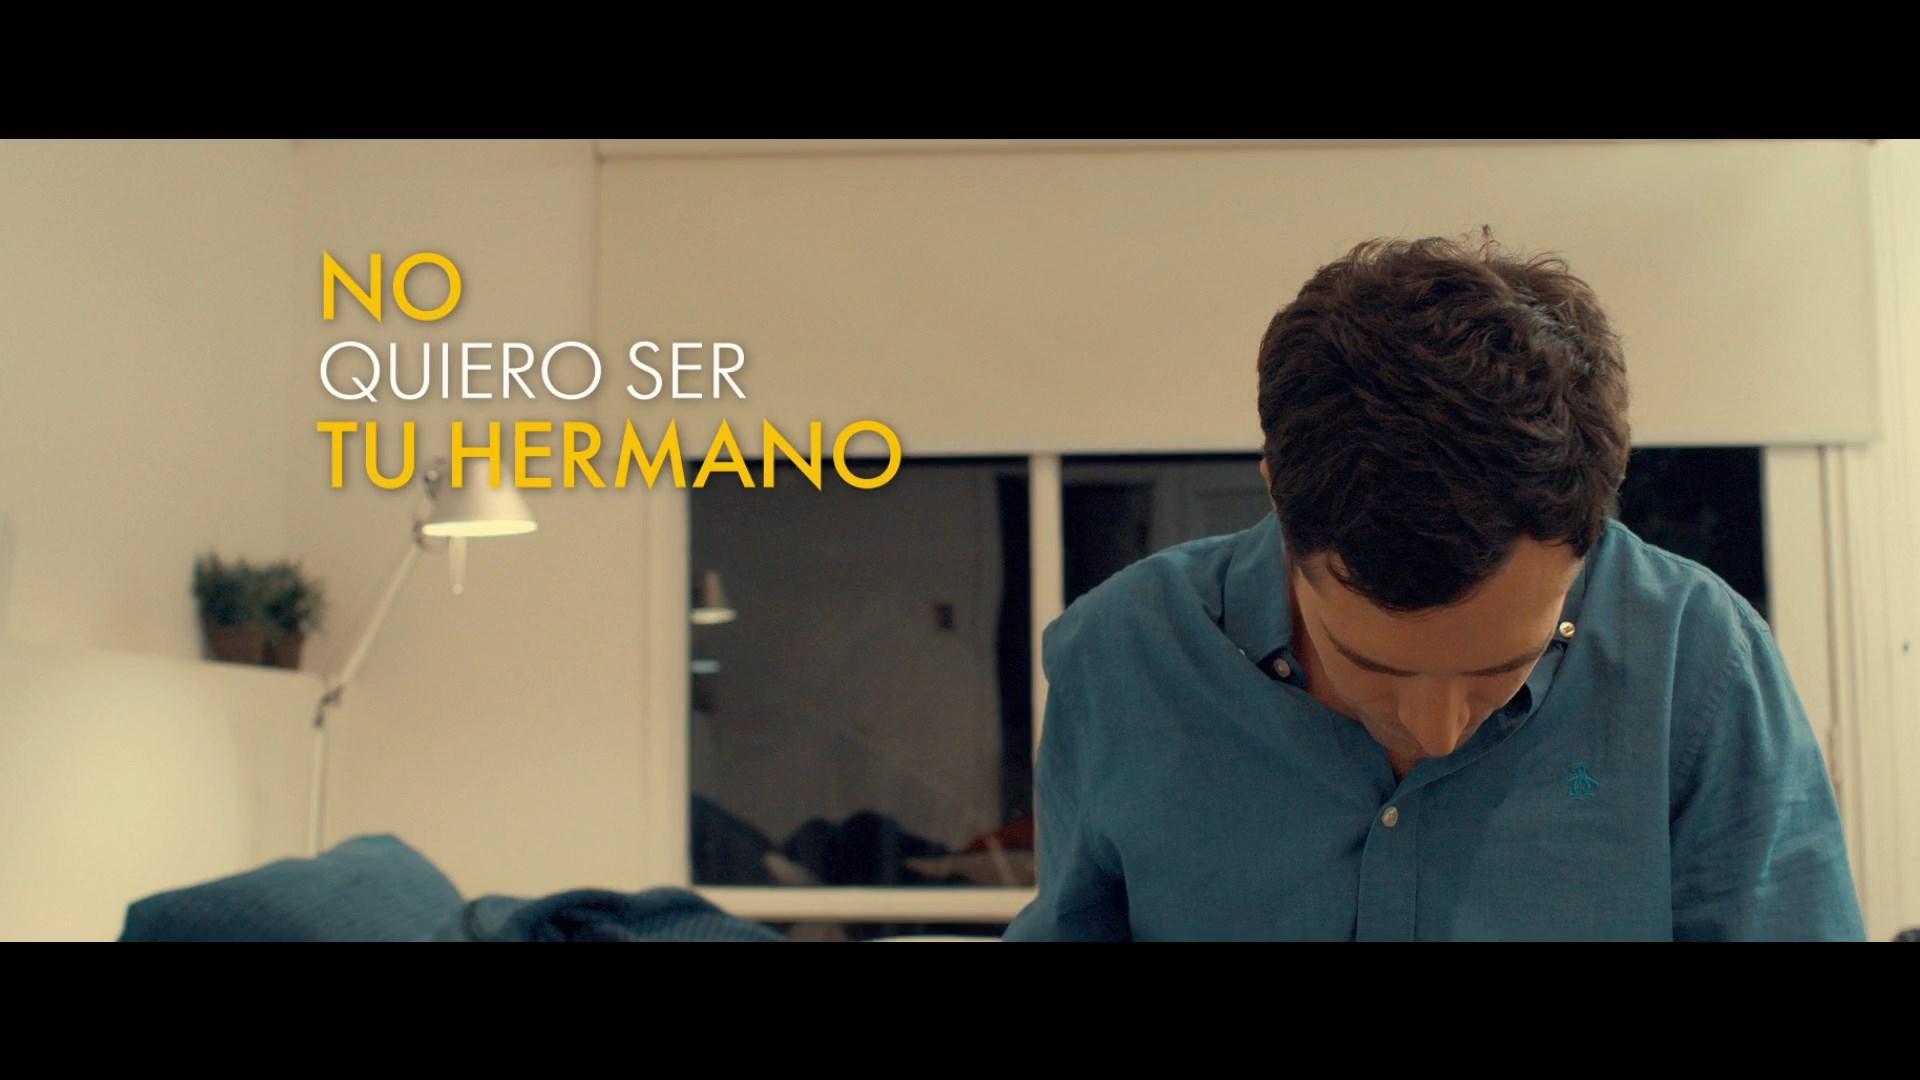 No quiero ser tu hermano (2019) 1080p WEB-DL Latino